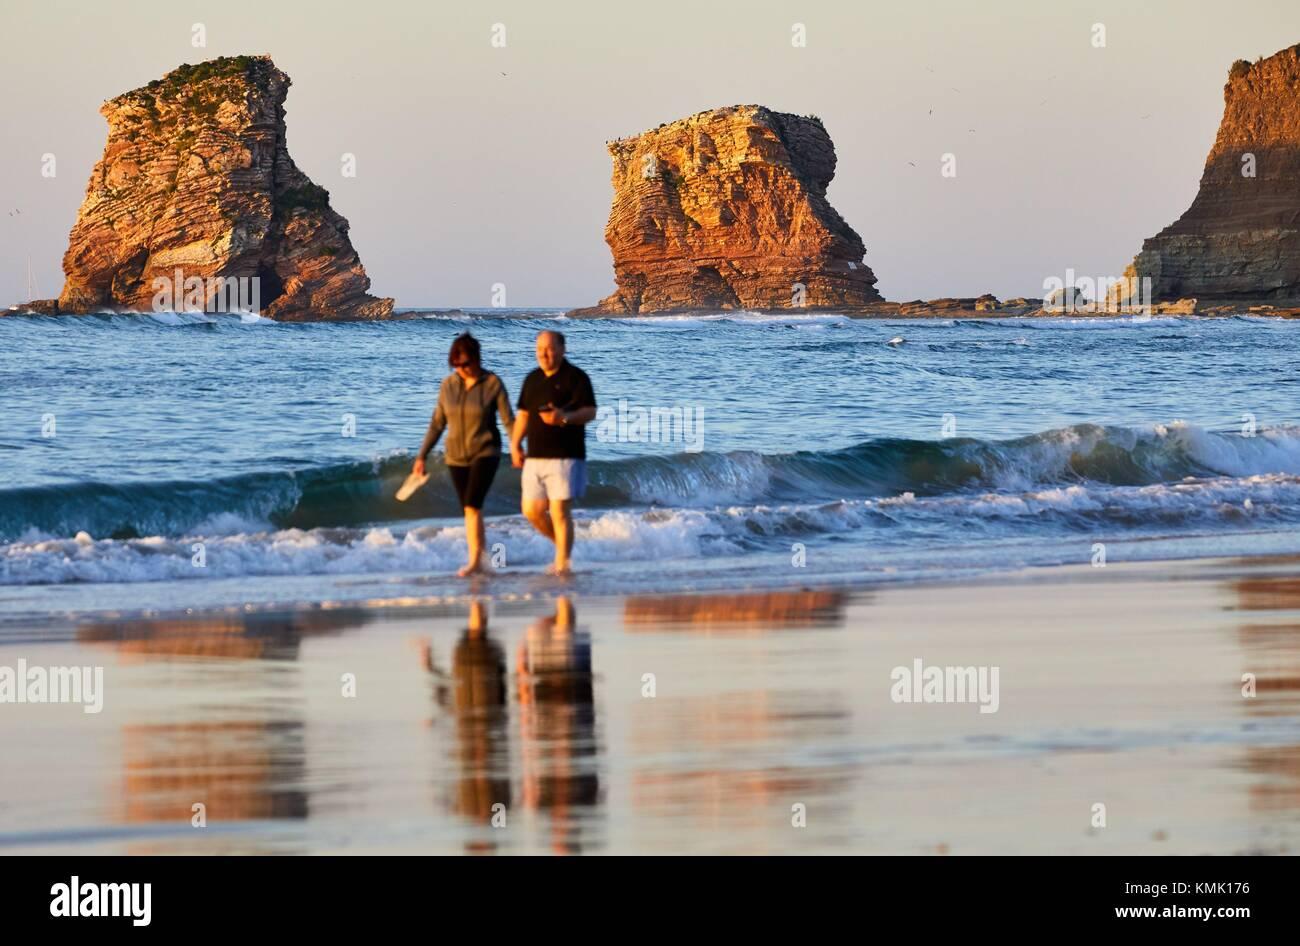 The Twin Rock, Beach, Hendaye, Aquitaine, Pyrenees Atlantiques, France - Stock Image